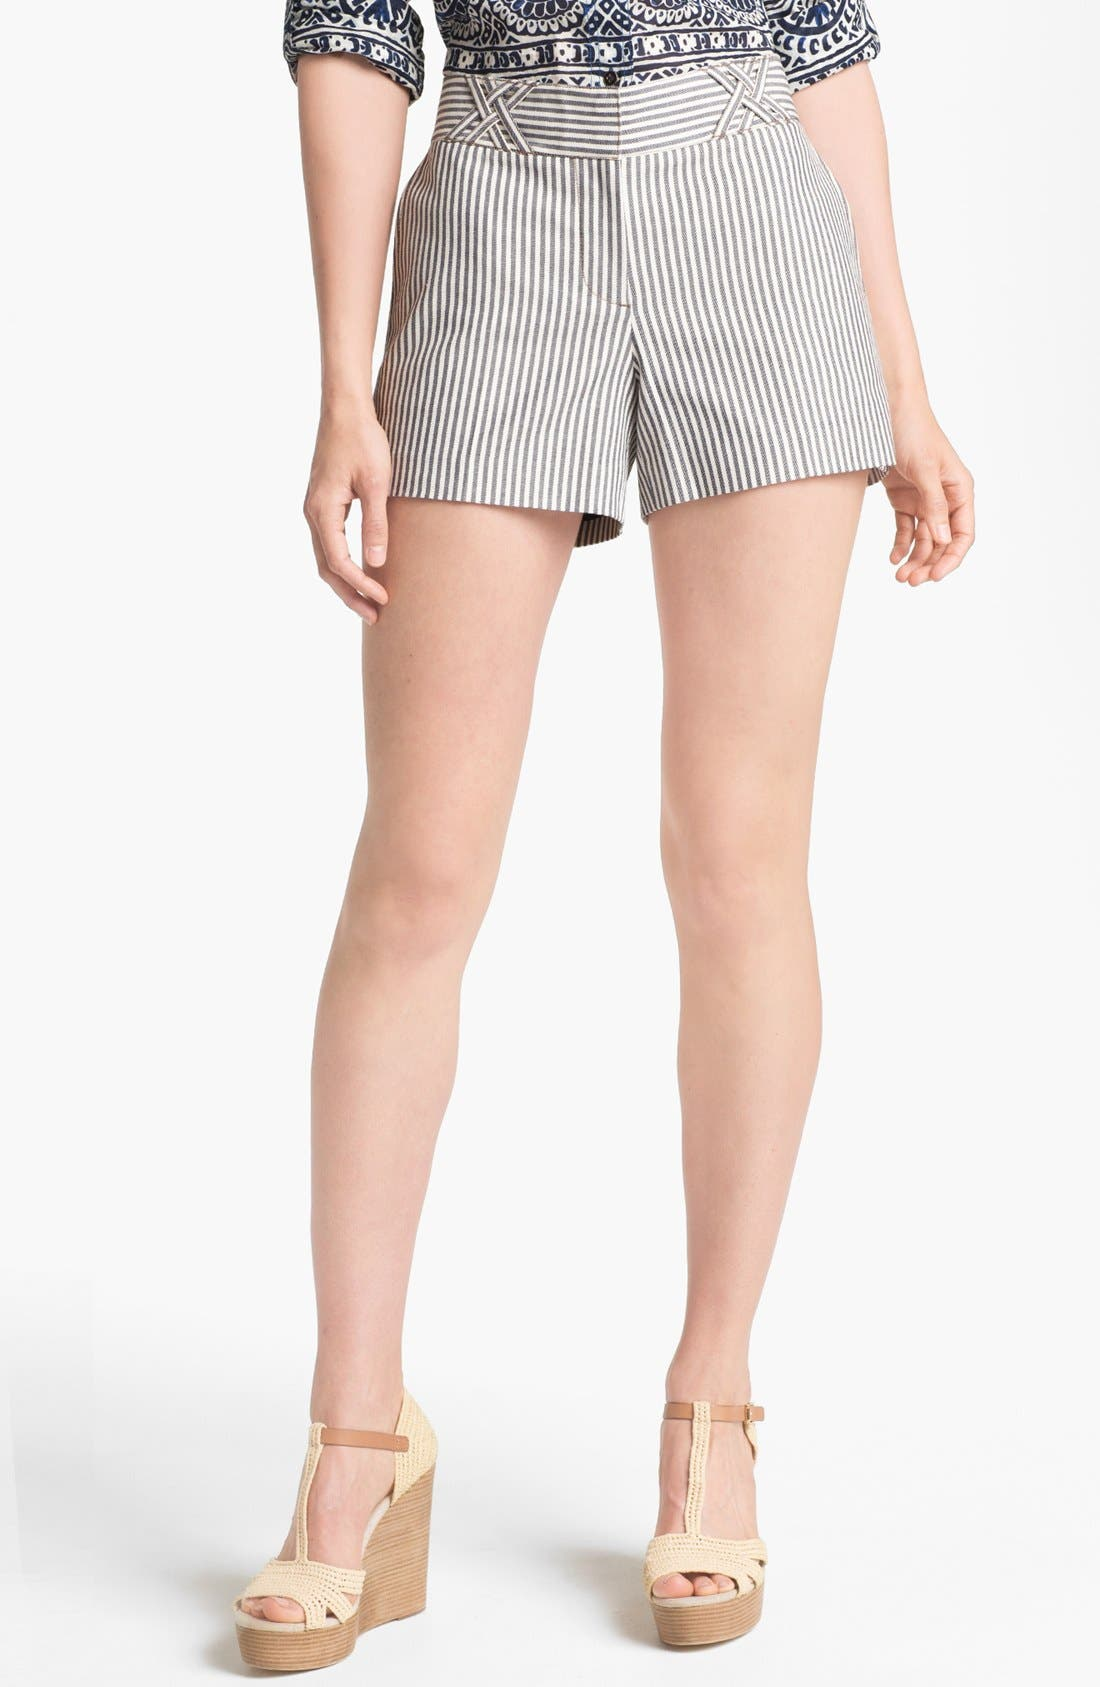 Alternate Image 1 Selected - Tory Burch 'Sarah Jane' Stripe Shorts